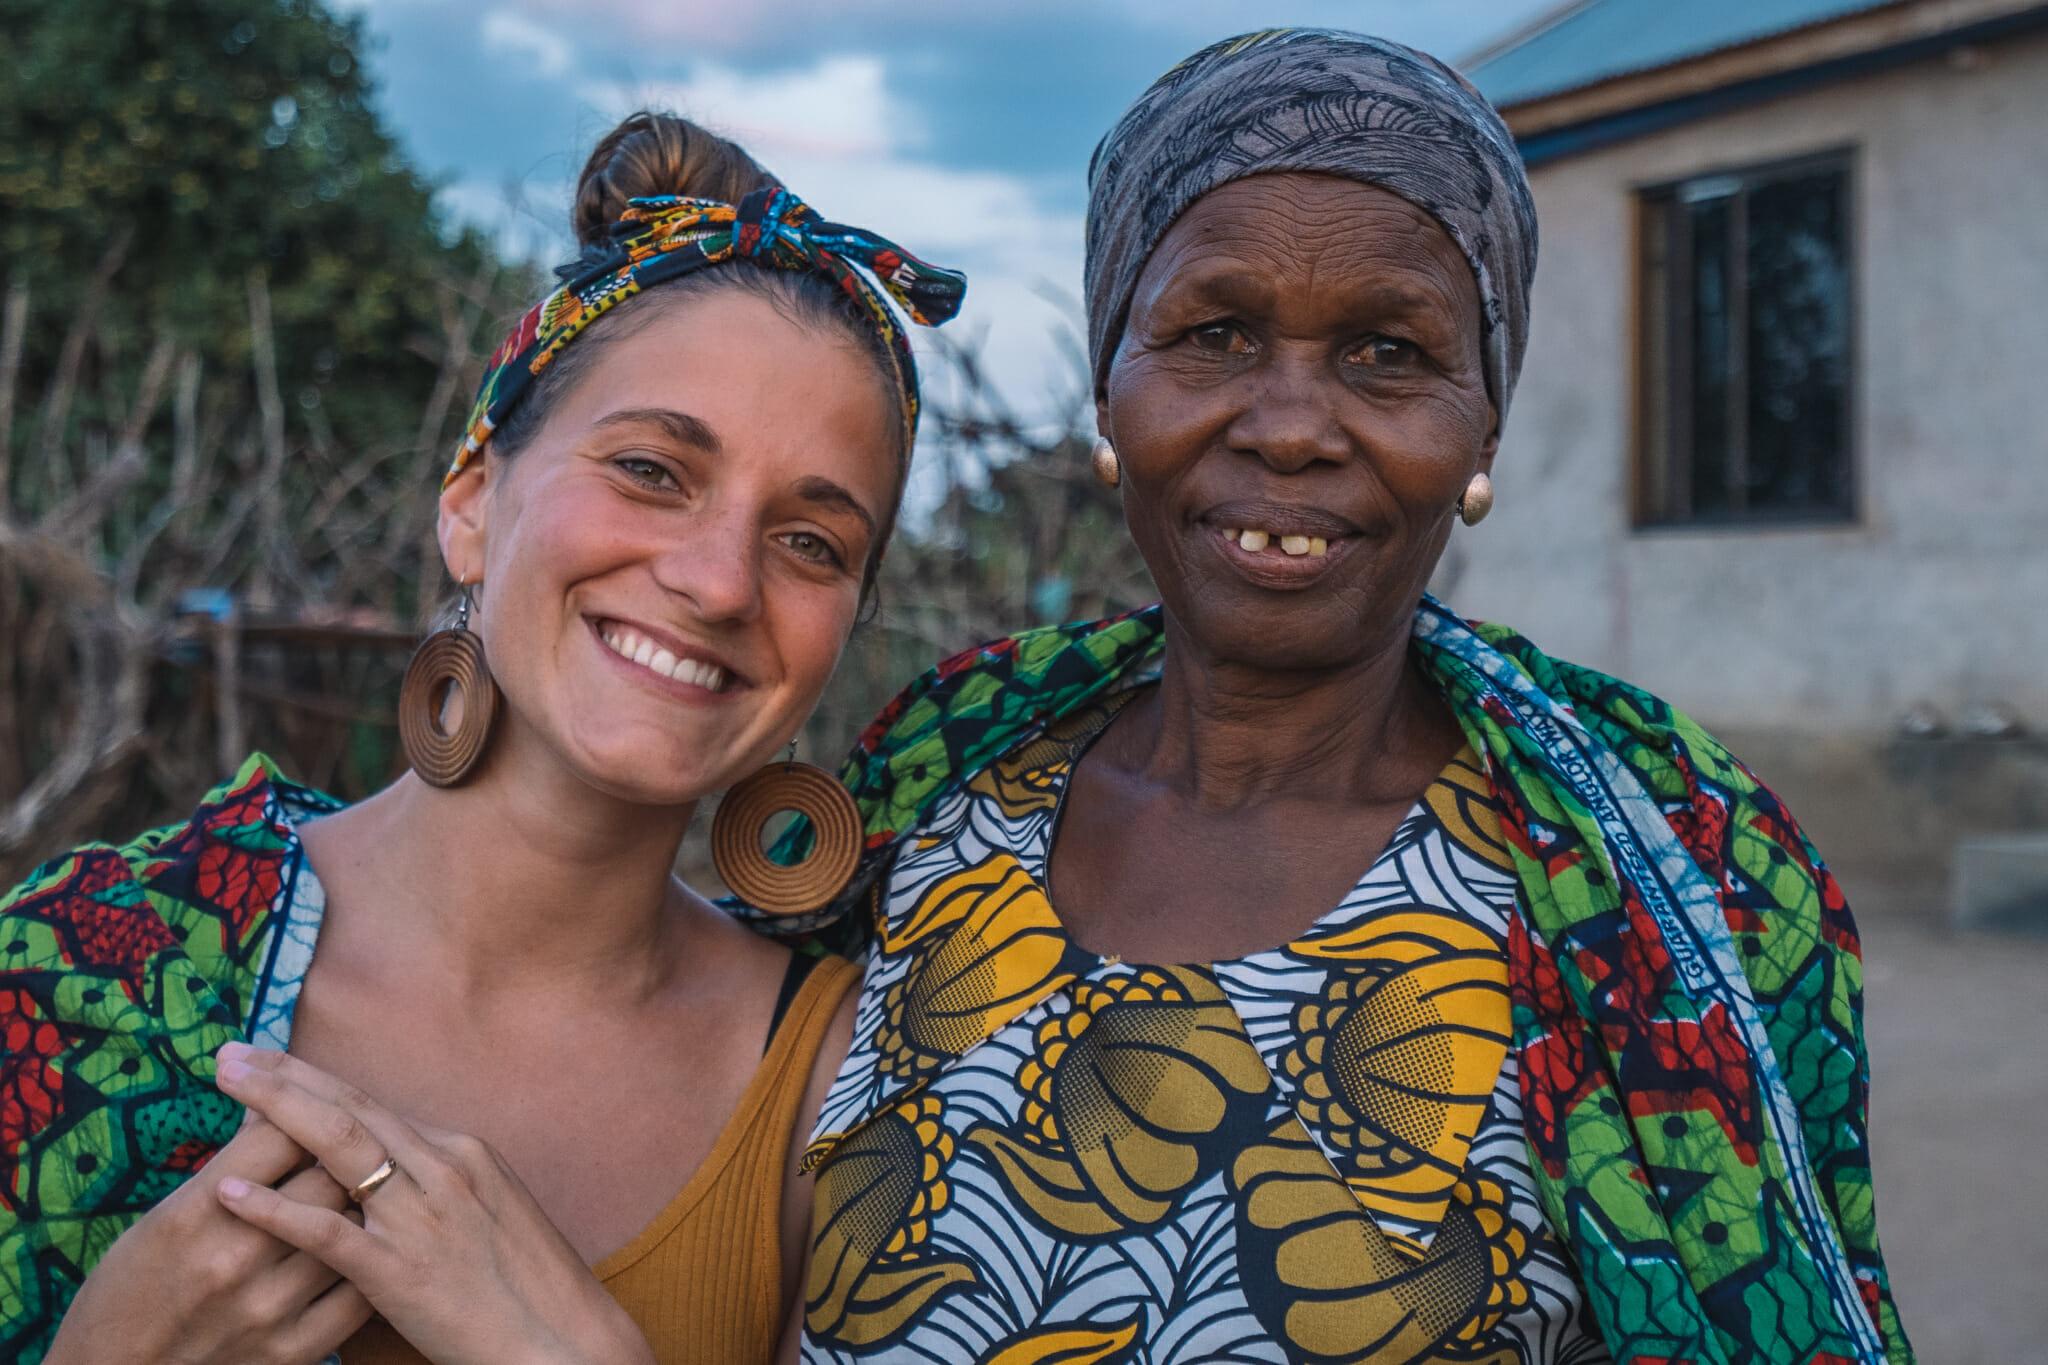 Rencontre avec Veronica, la maman du village de Nyamburi en Tanzanie